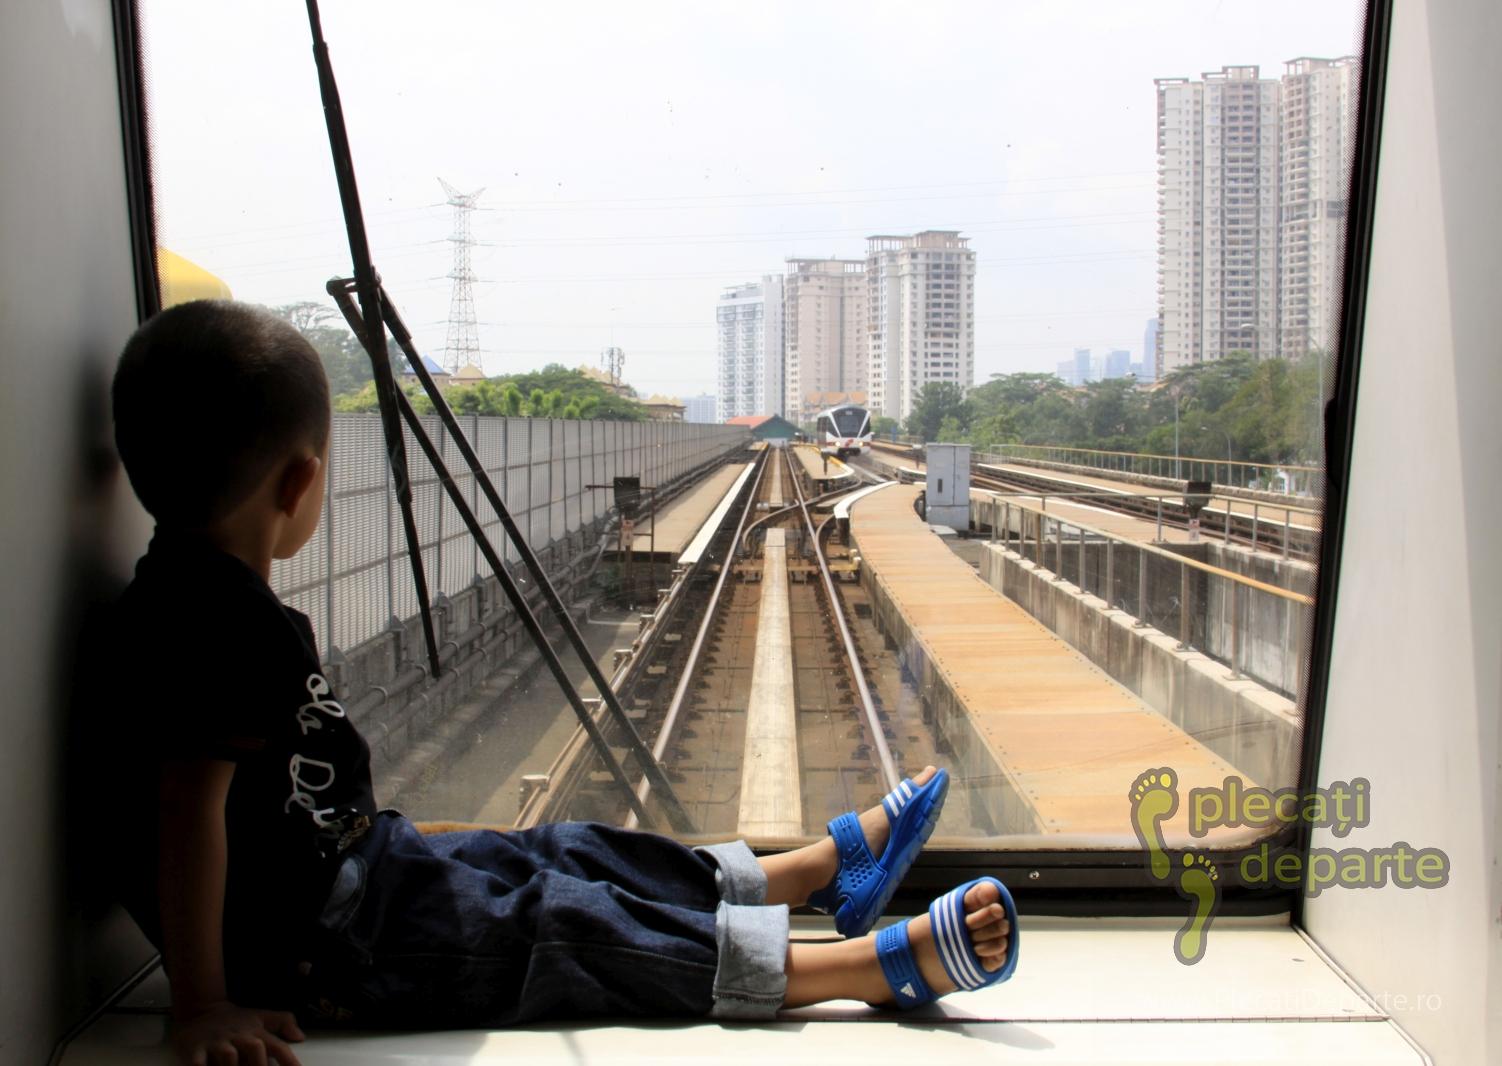 trenul LRT transport in comun pret bilet, in Kuala Lumpur, Kuala Lumpur, obiective turistice in 3 zile